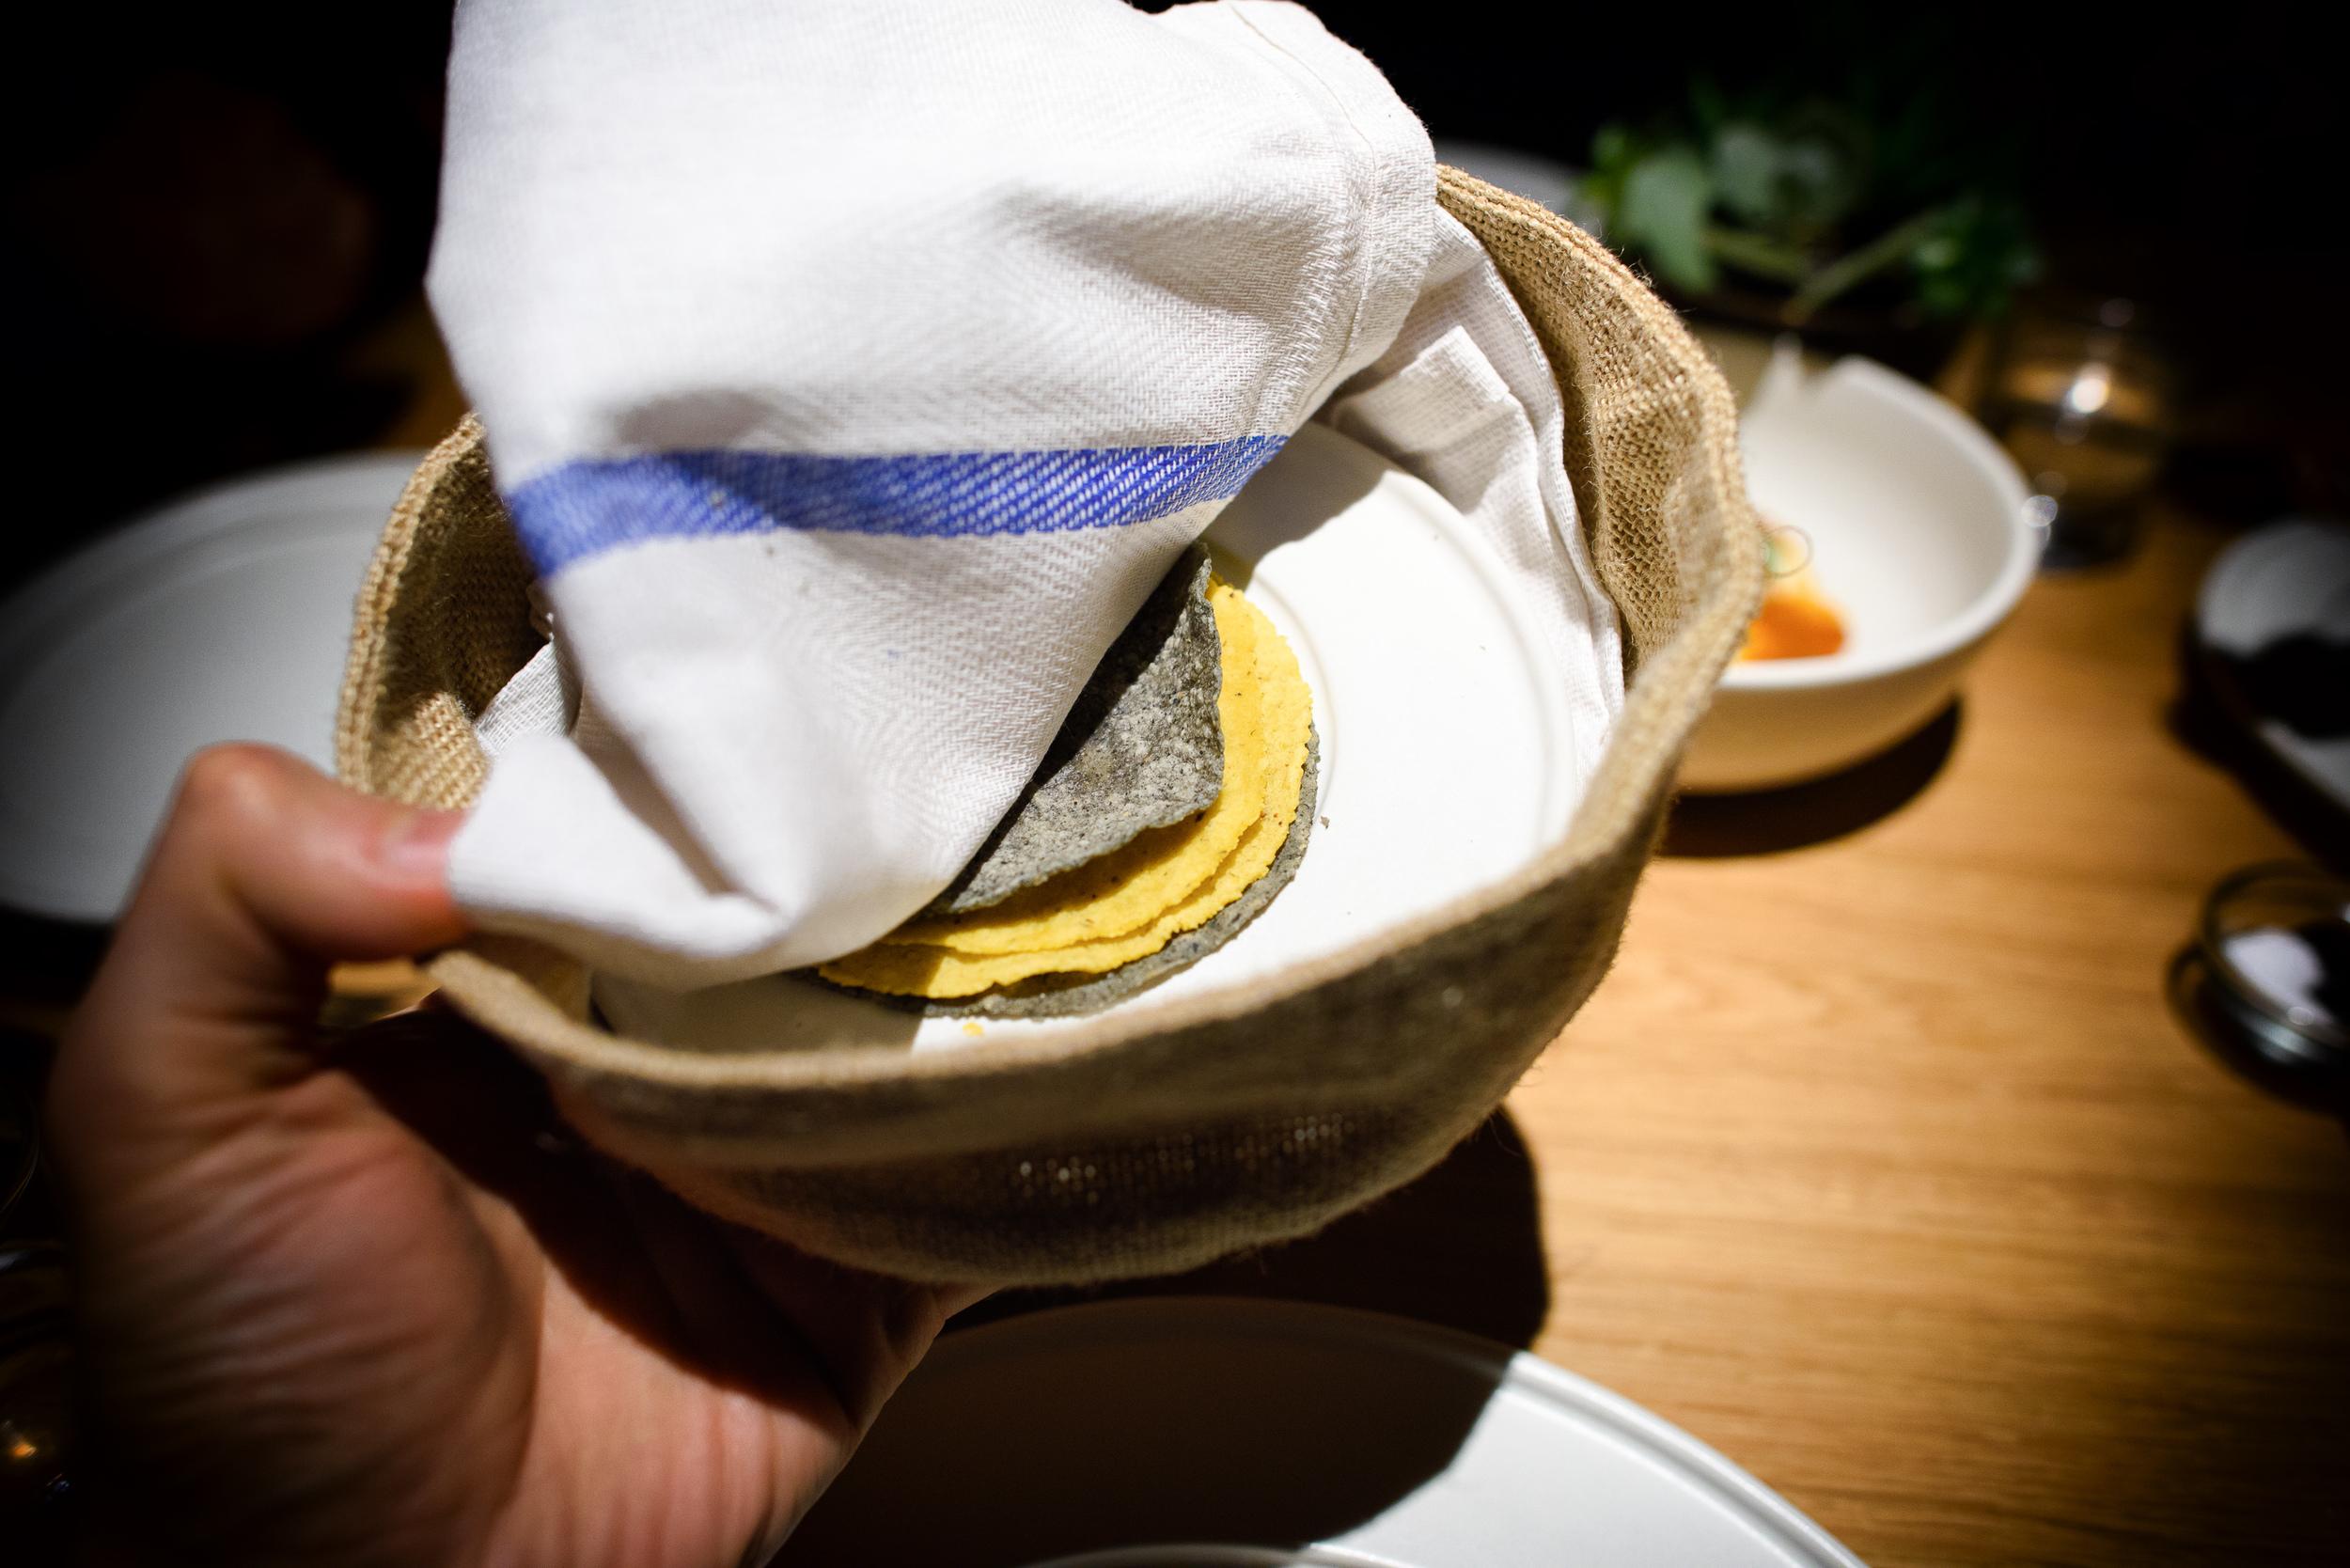 Blue and yellow-corn single origin tortillas